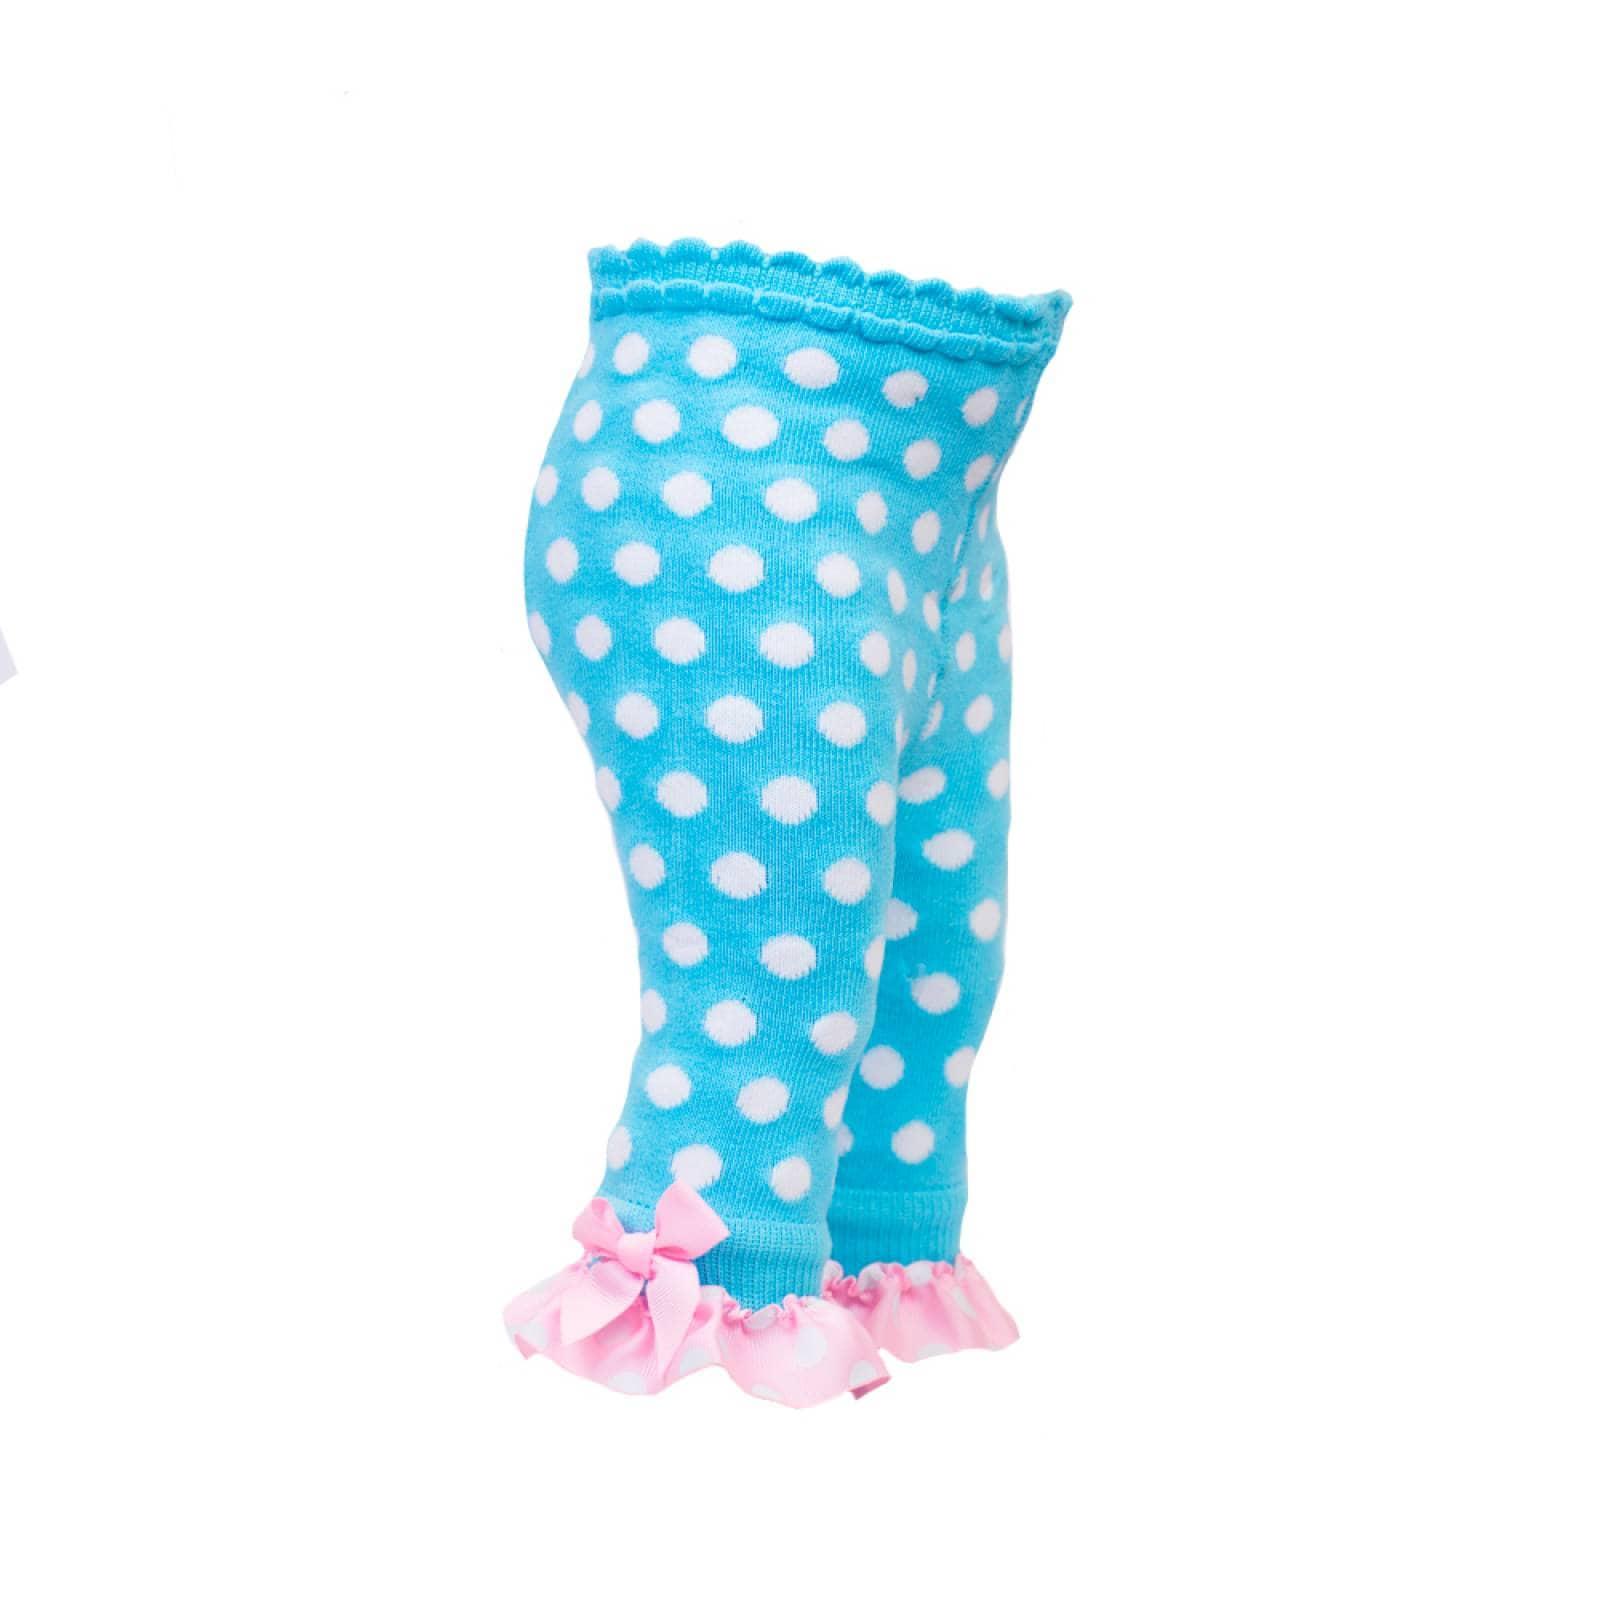 Legging Lunares Olan Tobillo algodón Azul 9-18 Meses Baby Room